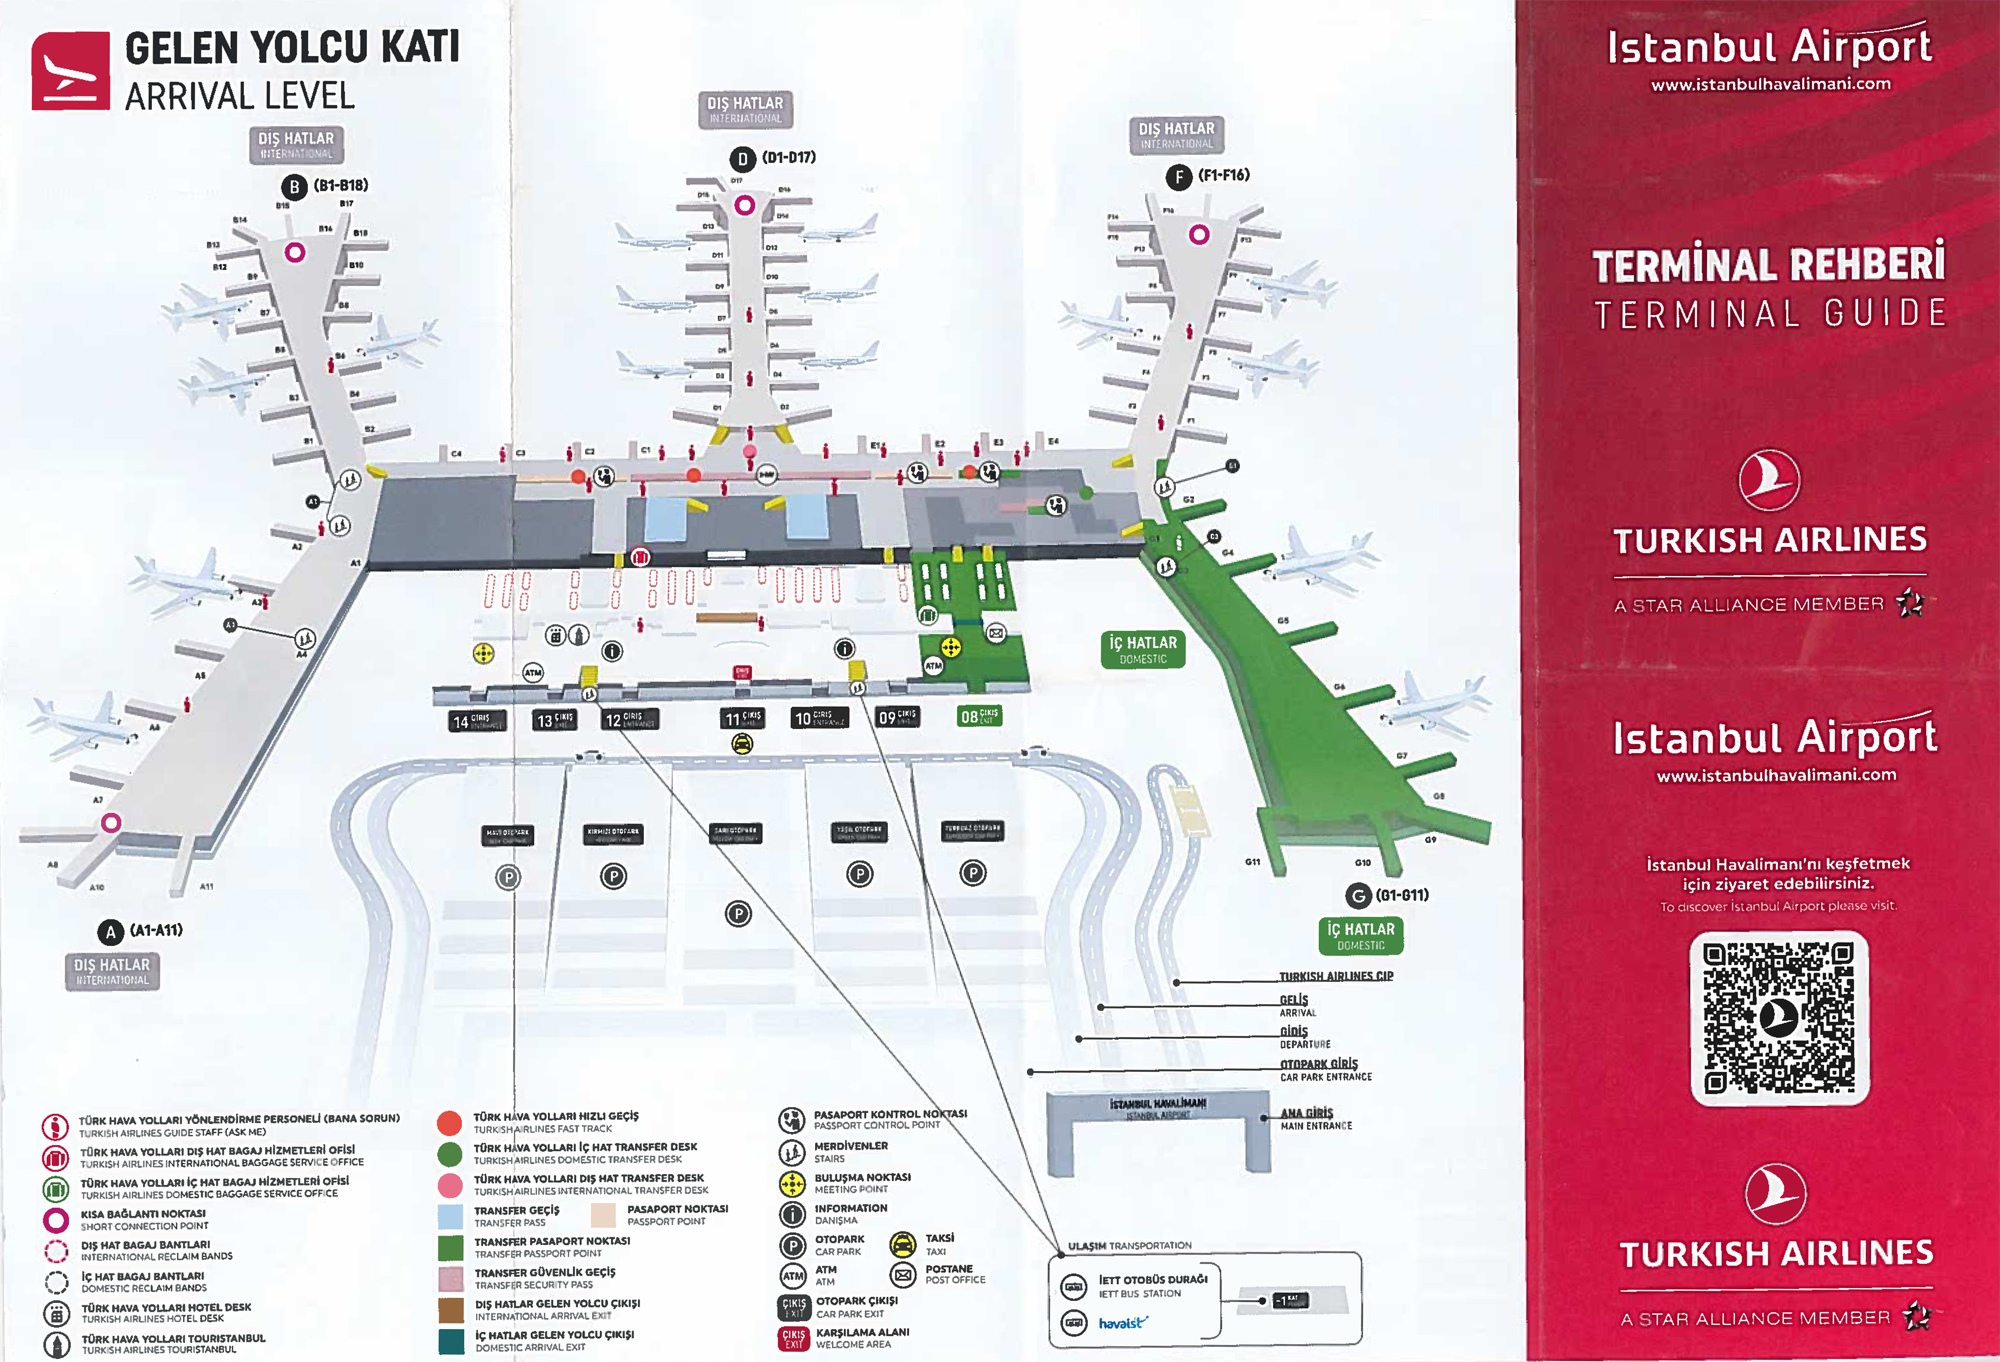 ataturk airport arrivals map Istanbul New Airport Plan My Travels ataturk airport arrivals map